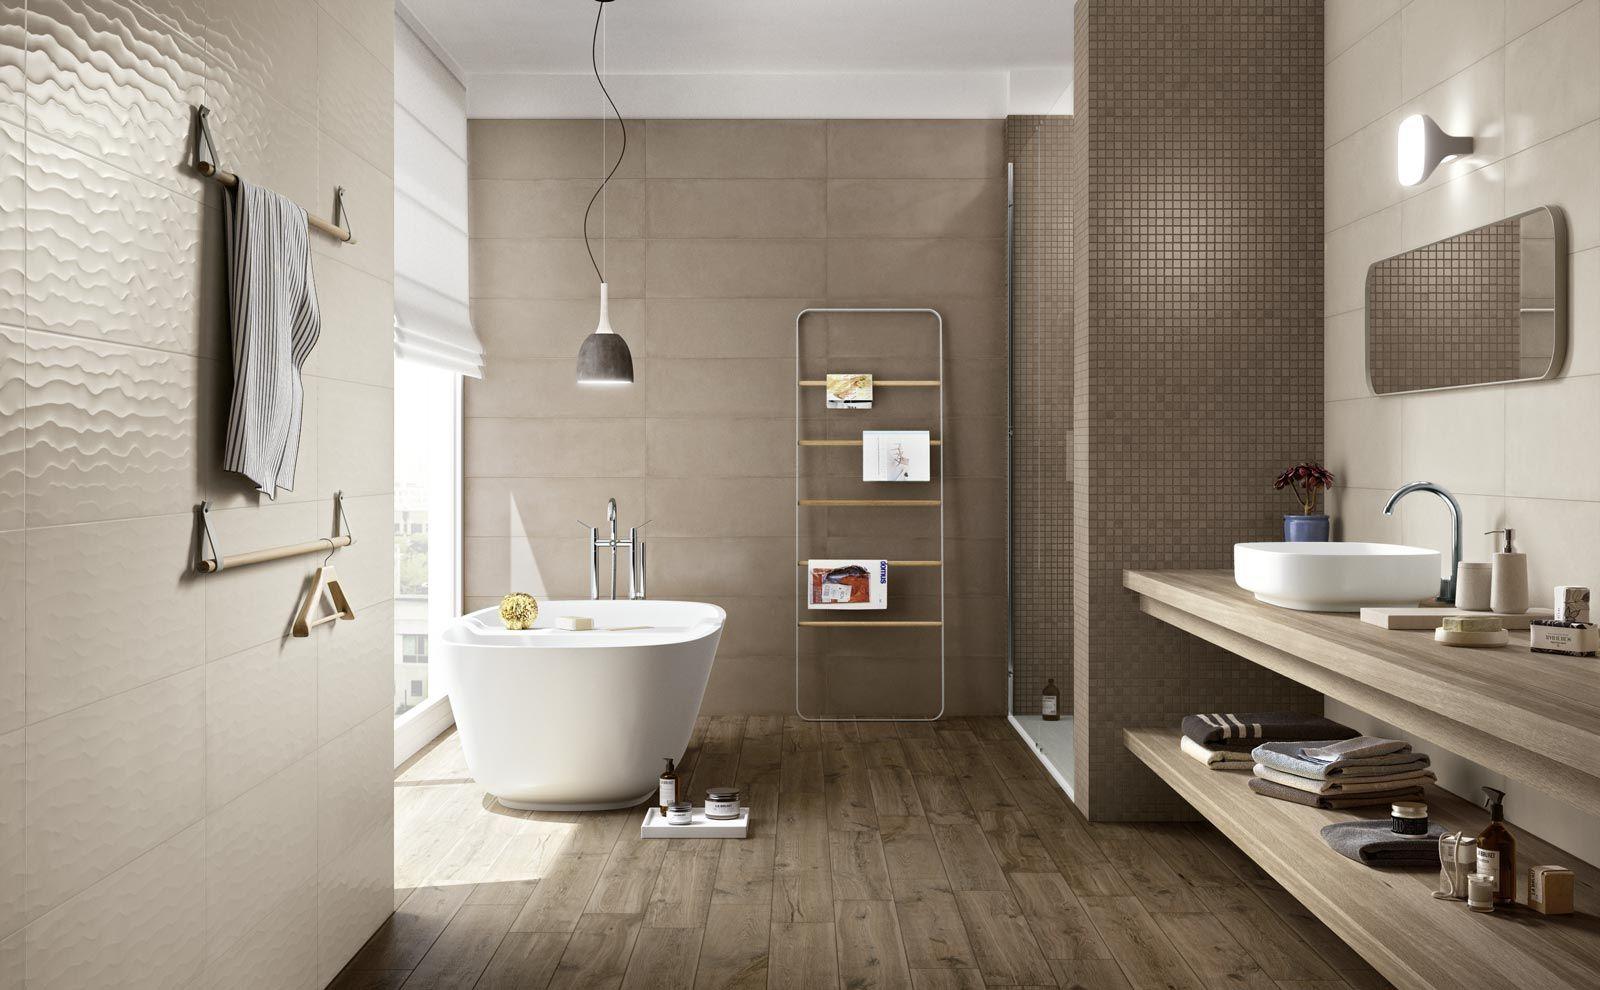 Rewind Wall Vitra Bathrooms Bathroom Wall Coverings Bathroom Interior